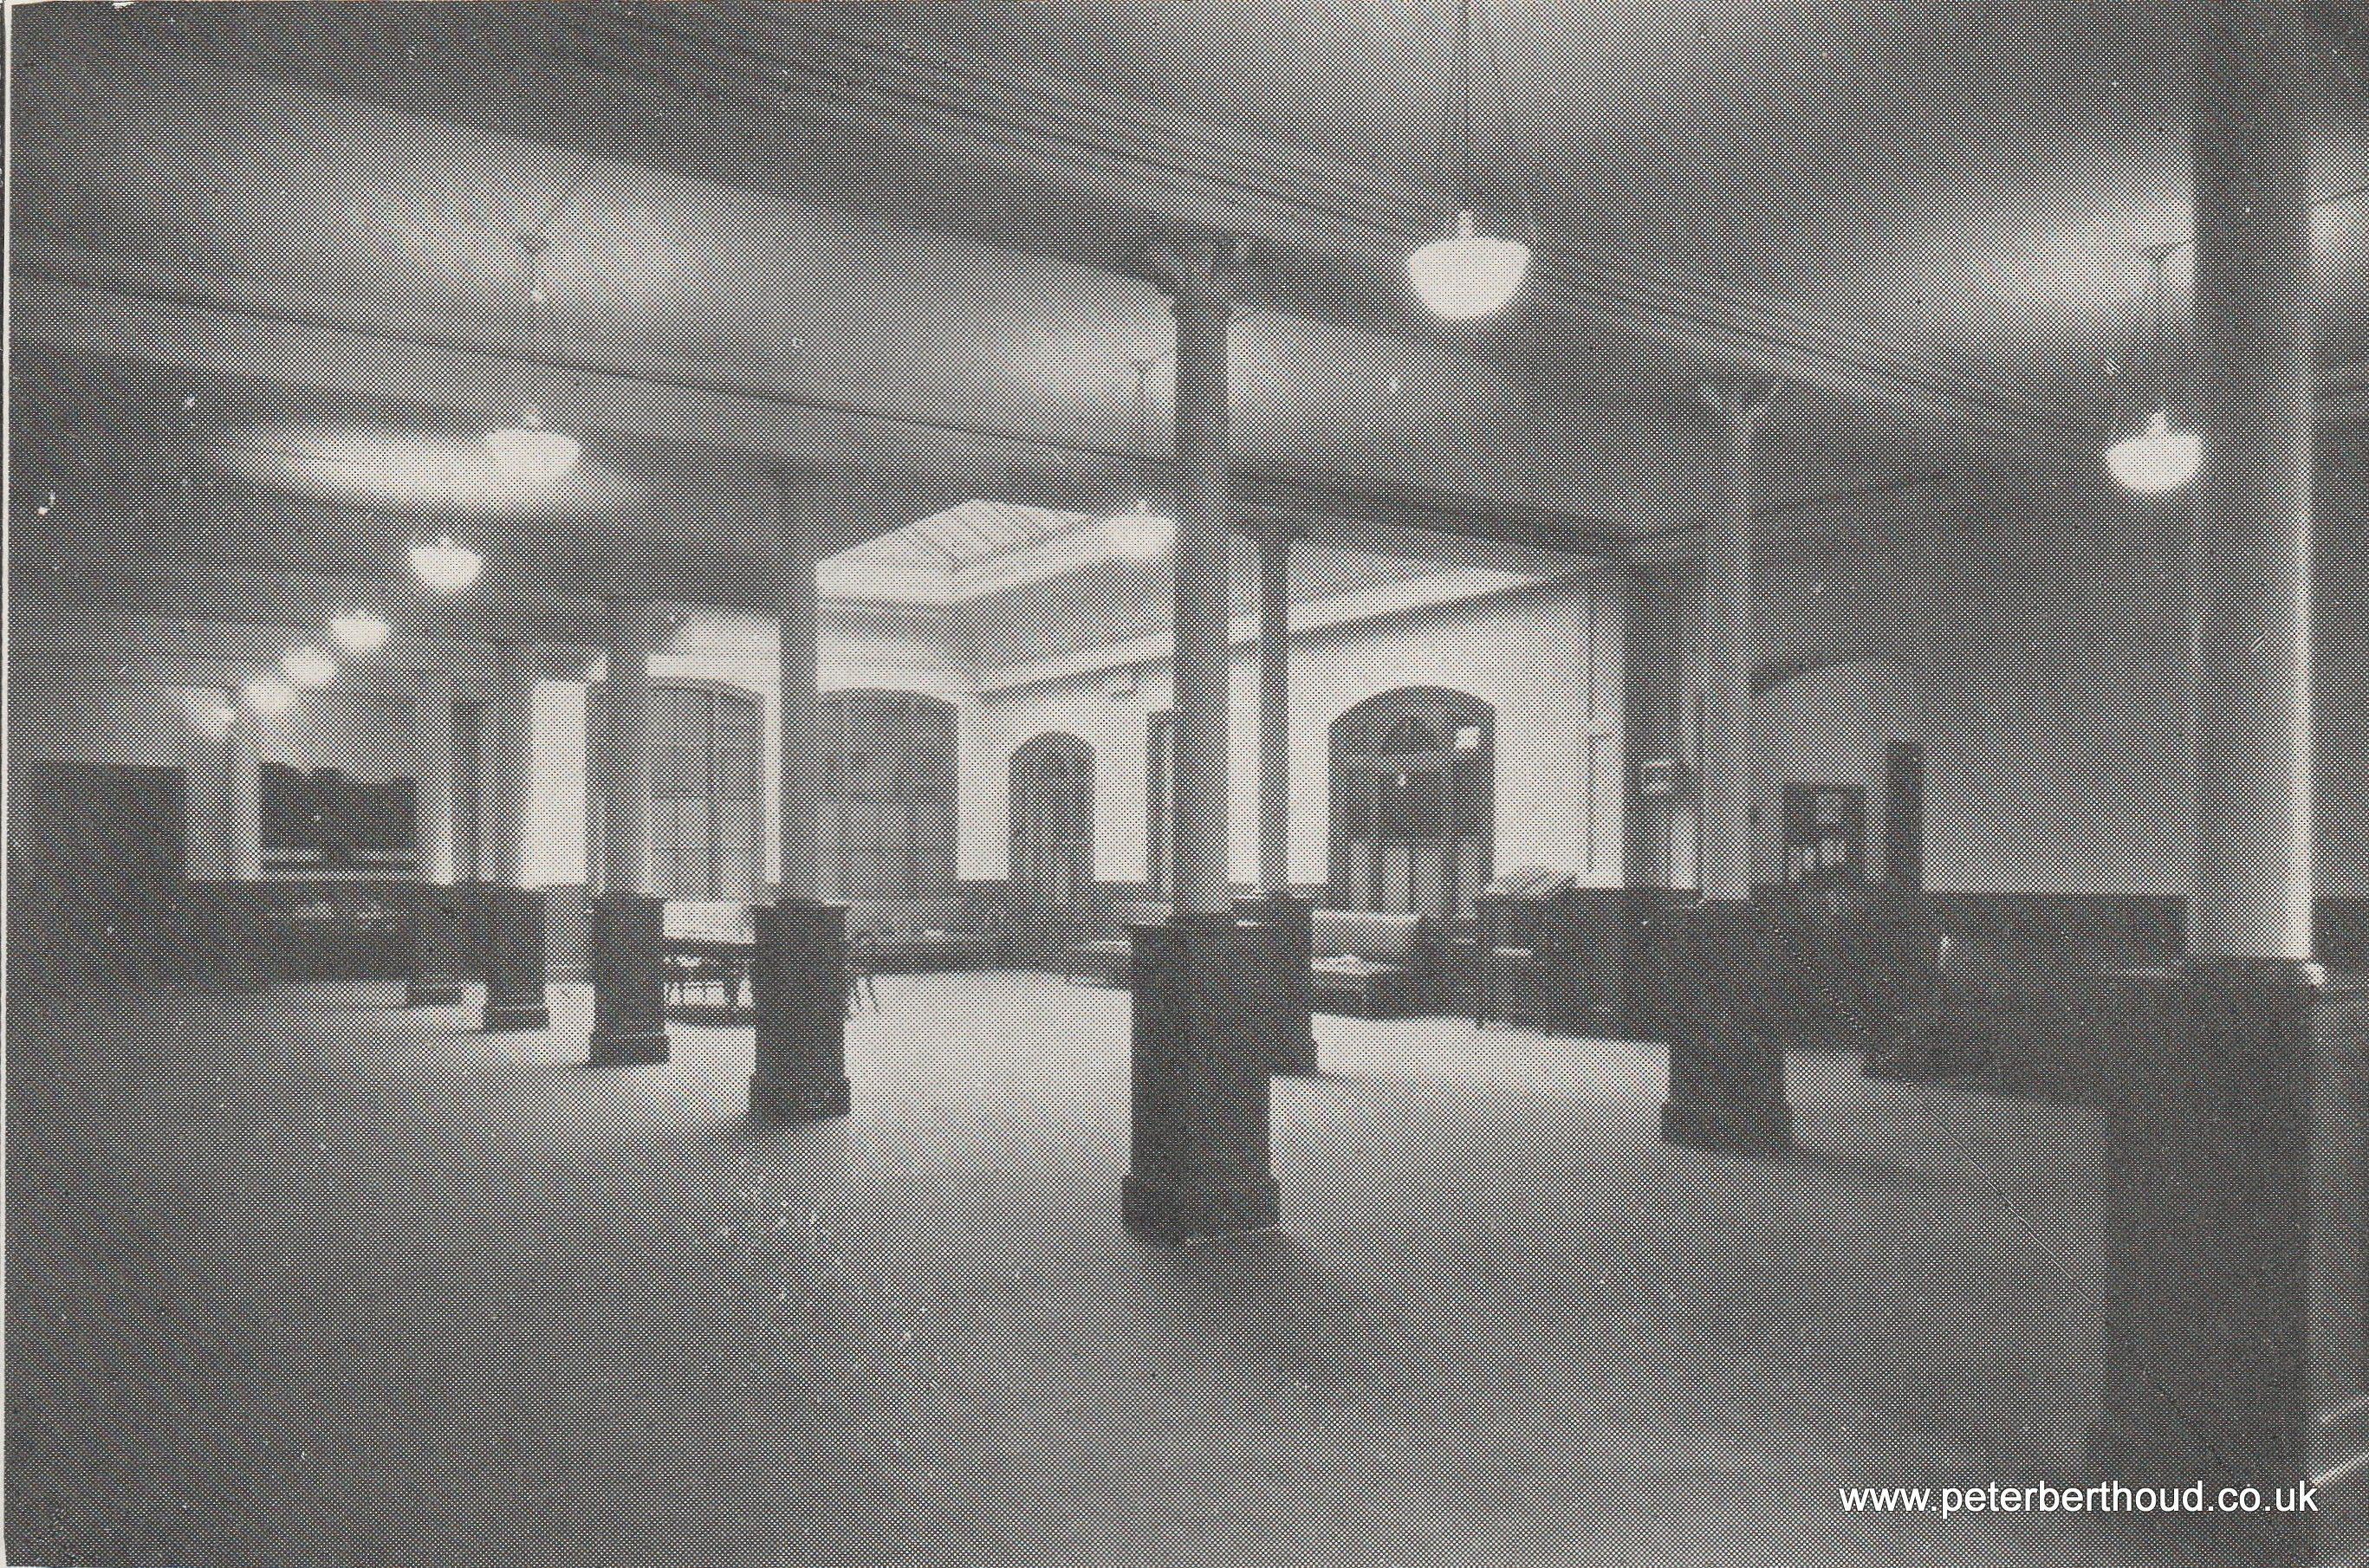 London Provision Exchange: Main Hall (1930)